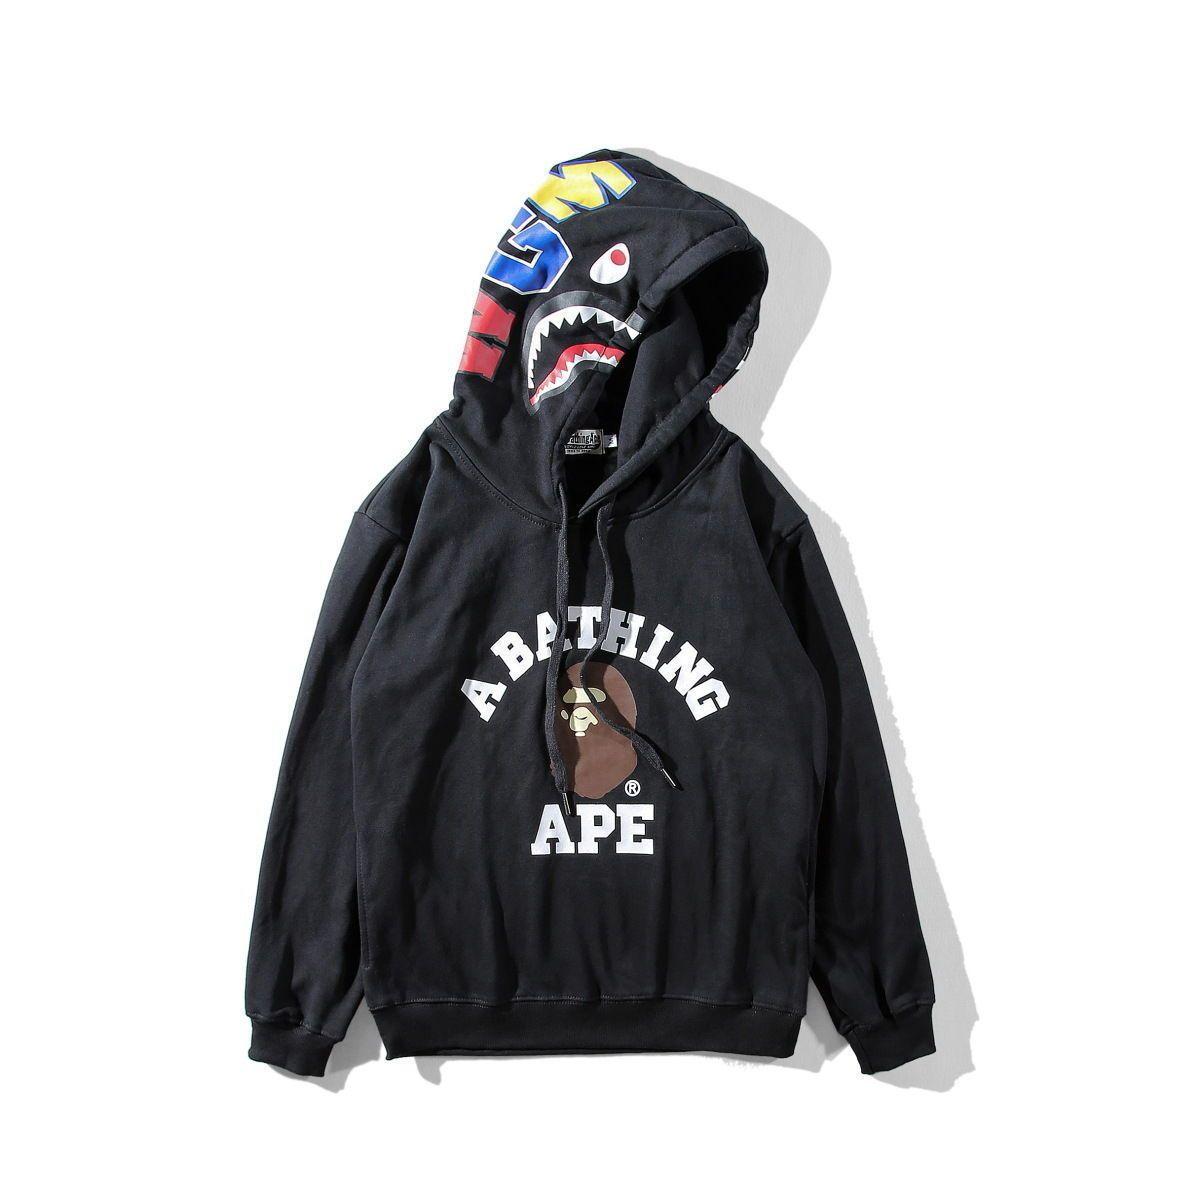 4e55b600f982 Latest A Bathing Ape Hoodie Hooded Shark Head Bape Black Sweatcoat  Sweatshirt